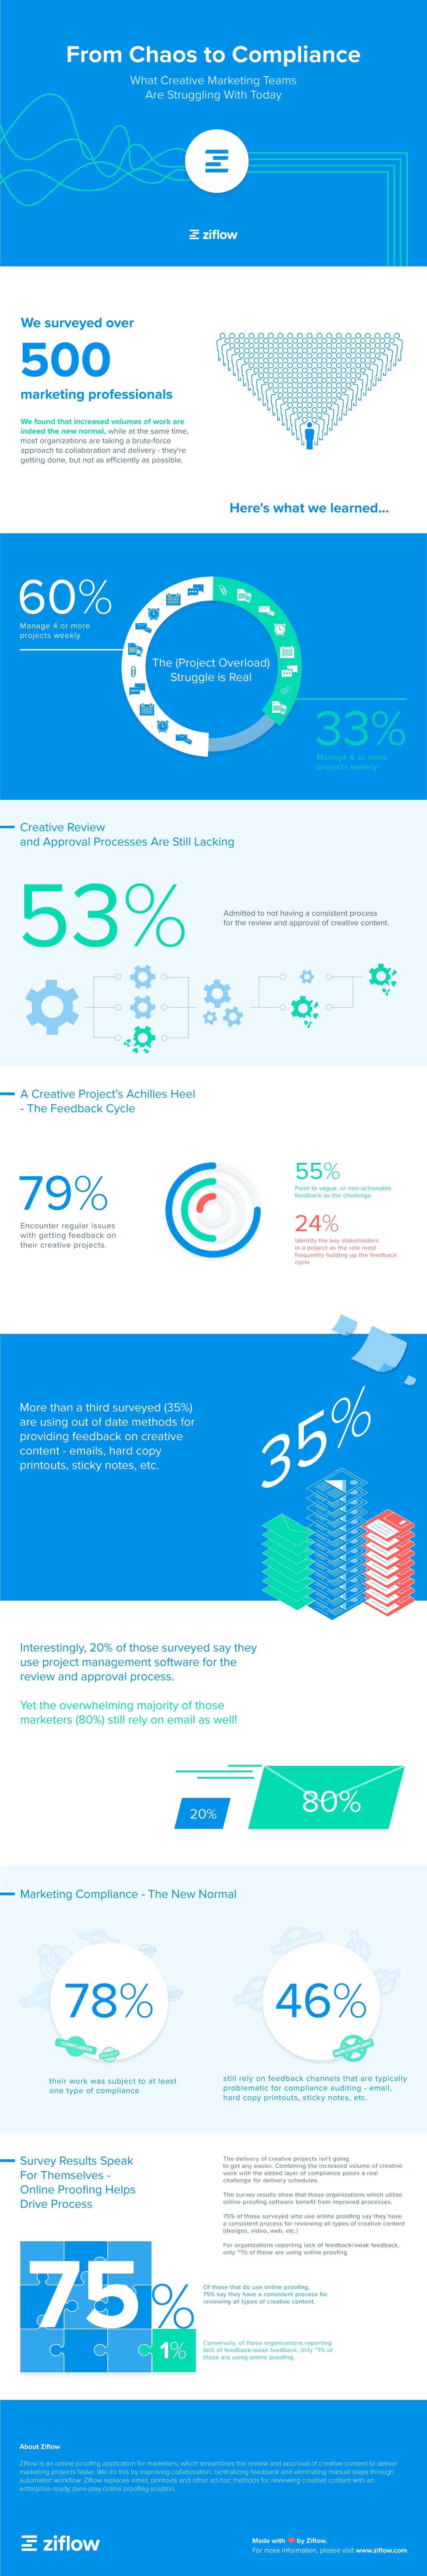 Infographic_ziflow.png